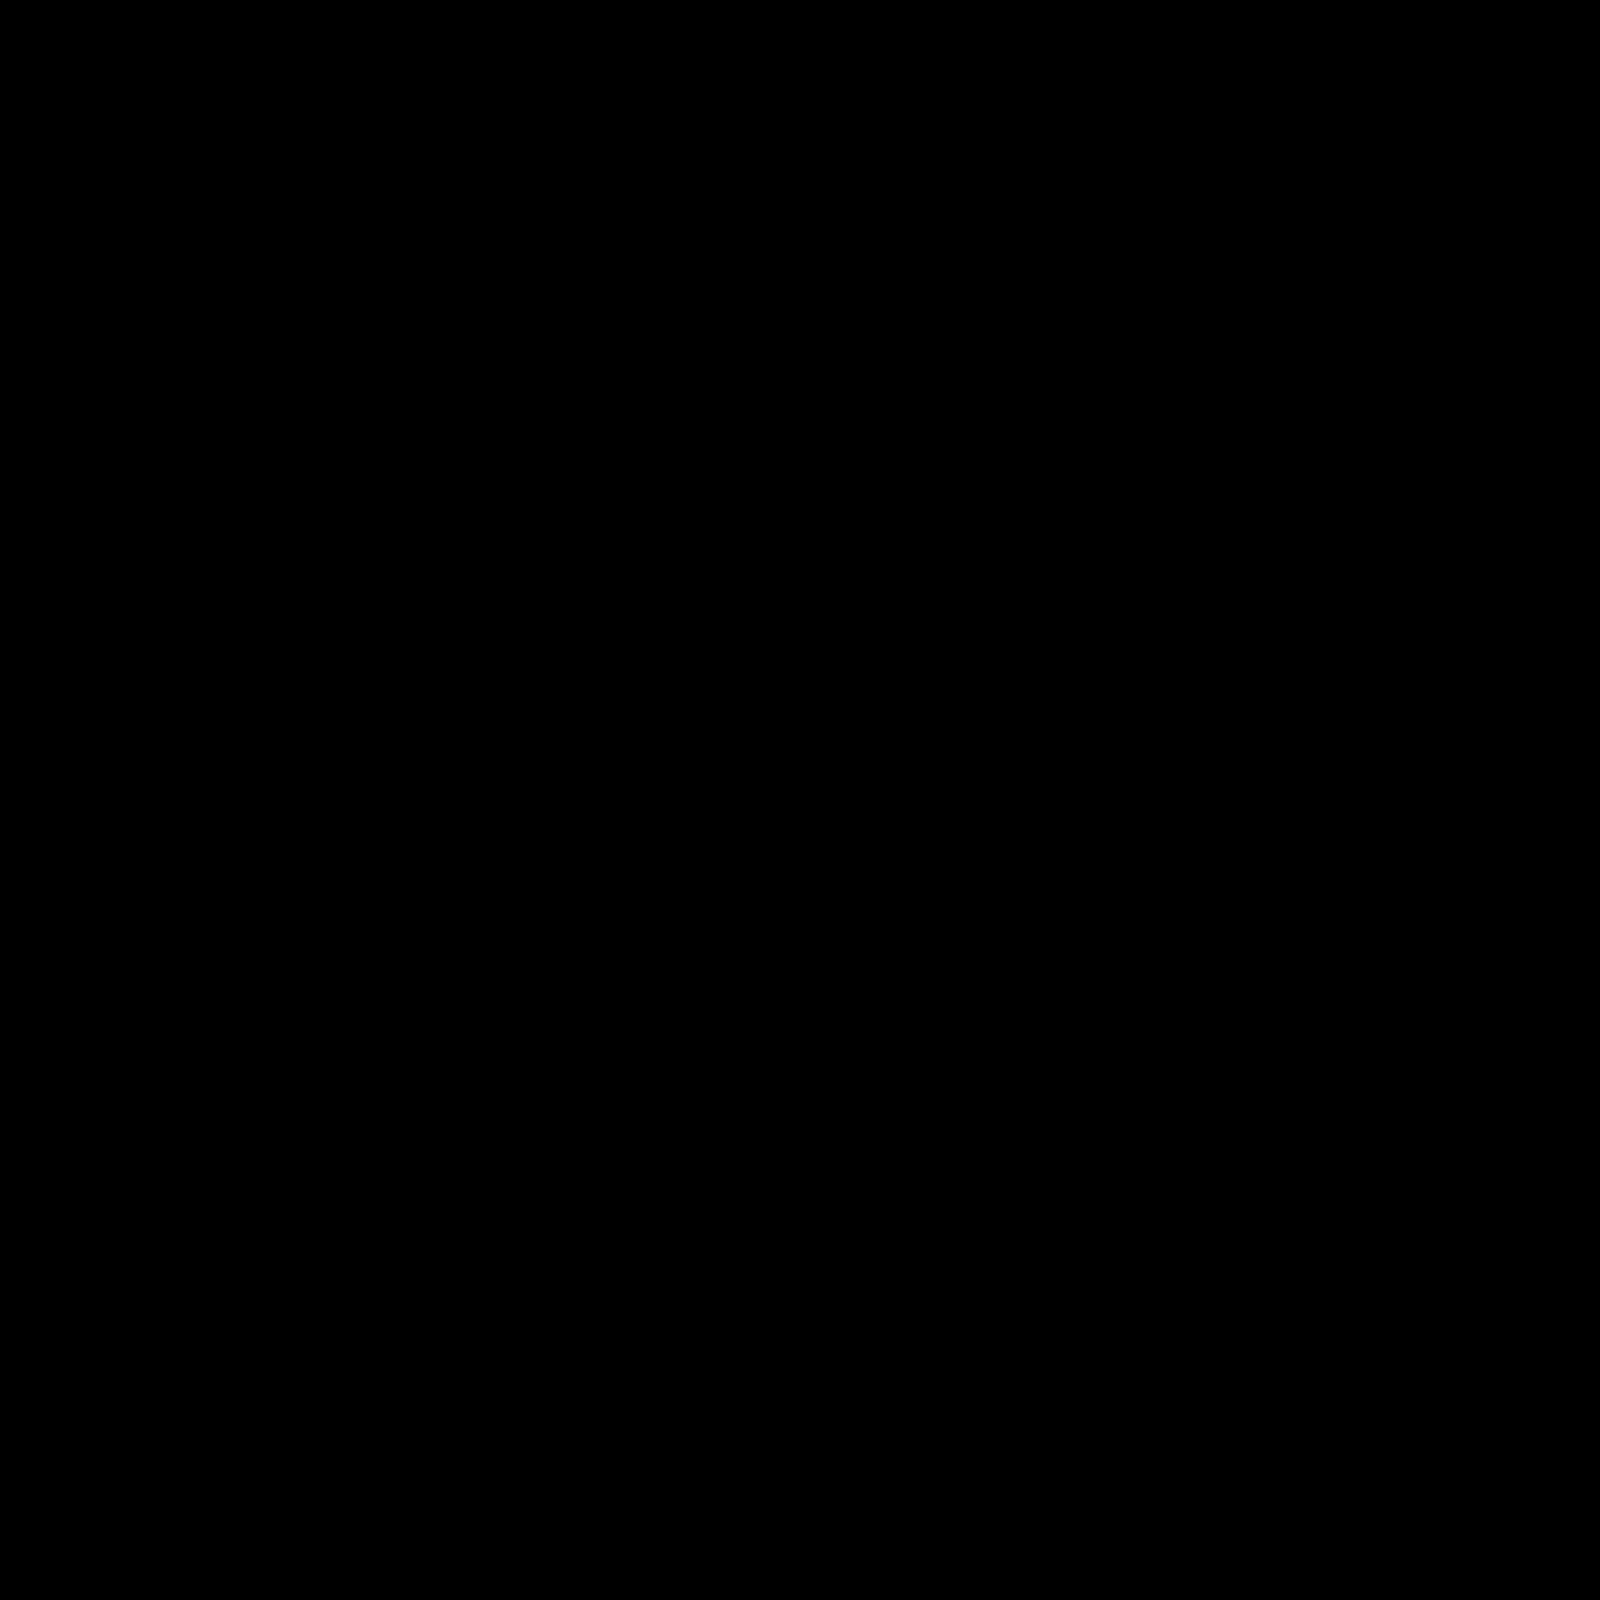 Icons acur lunamedia co. Logo clipart hotel